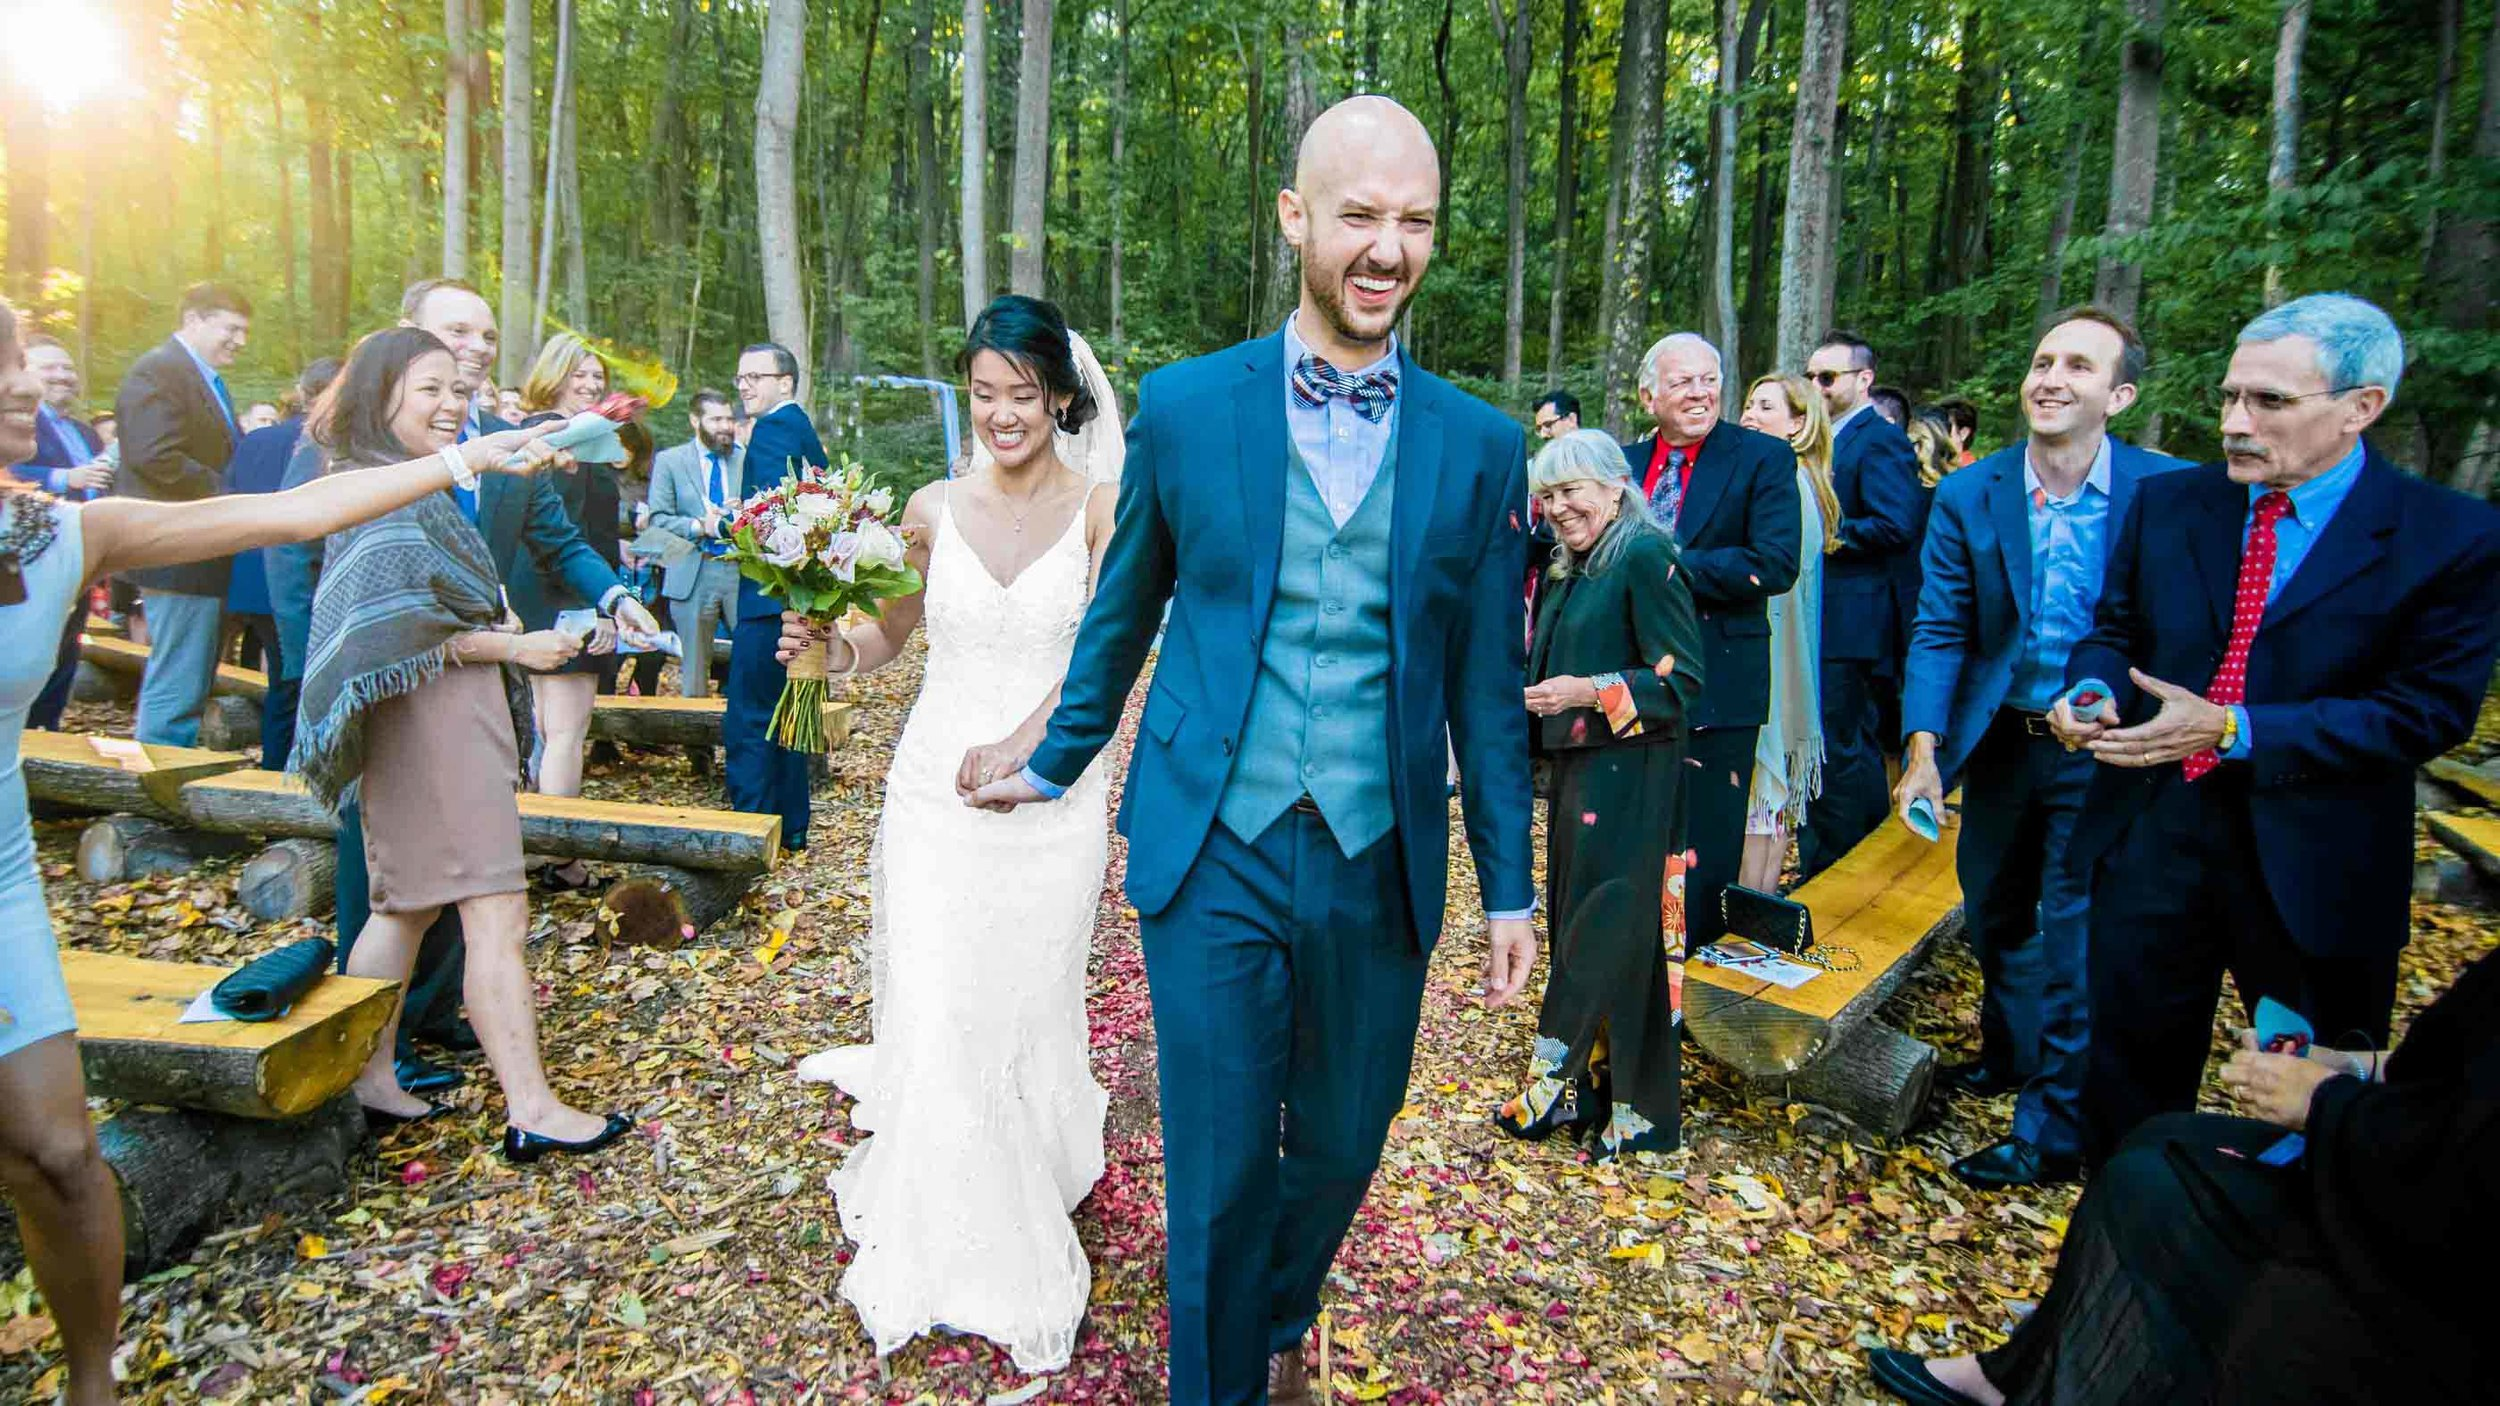 dc+metro+wedding+photography+vadym+guliuk-8579-7-54.jpg